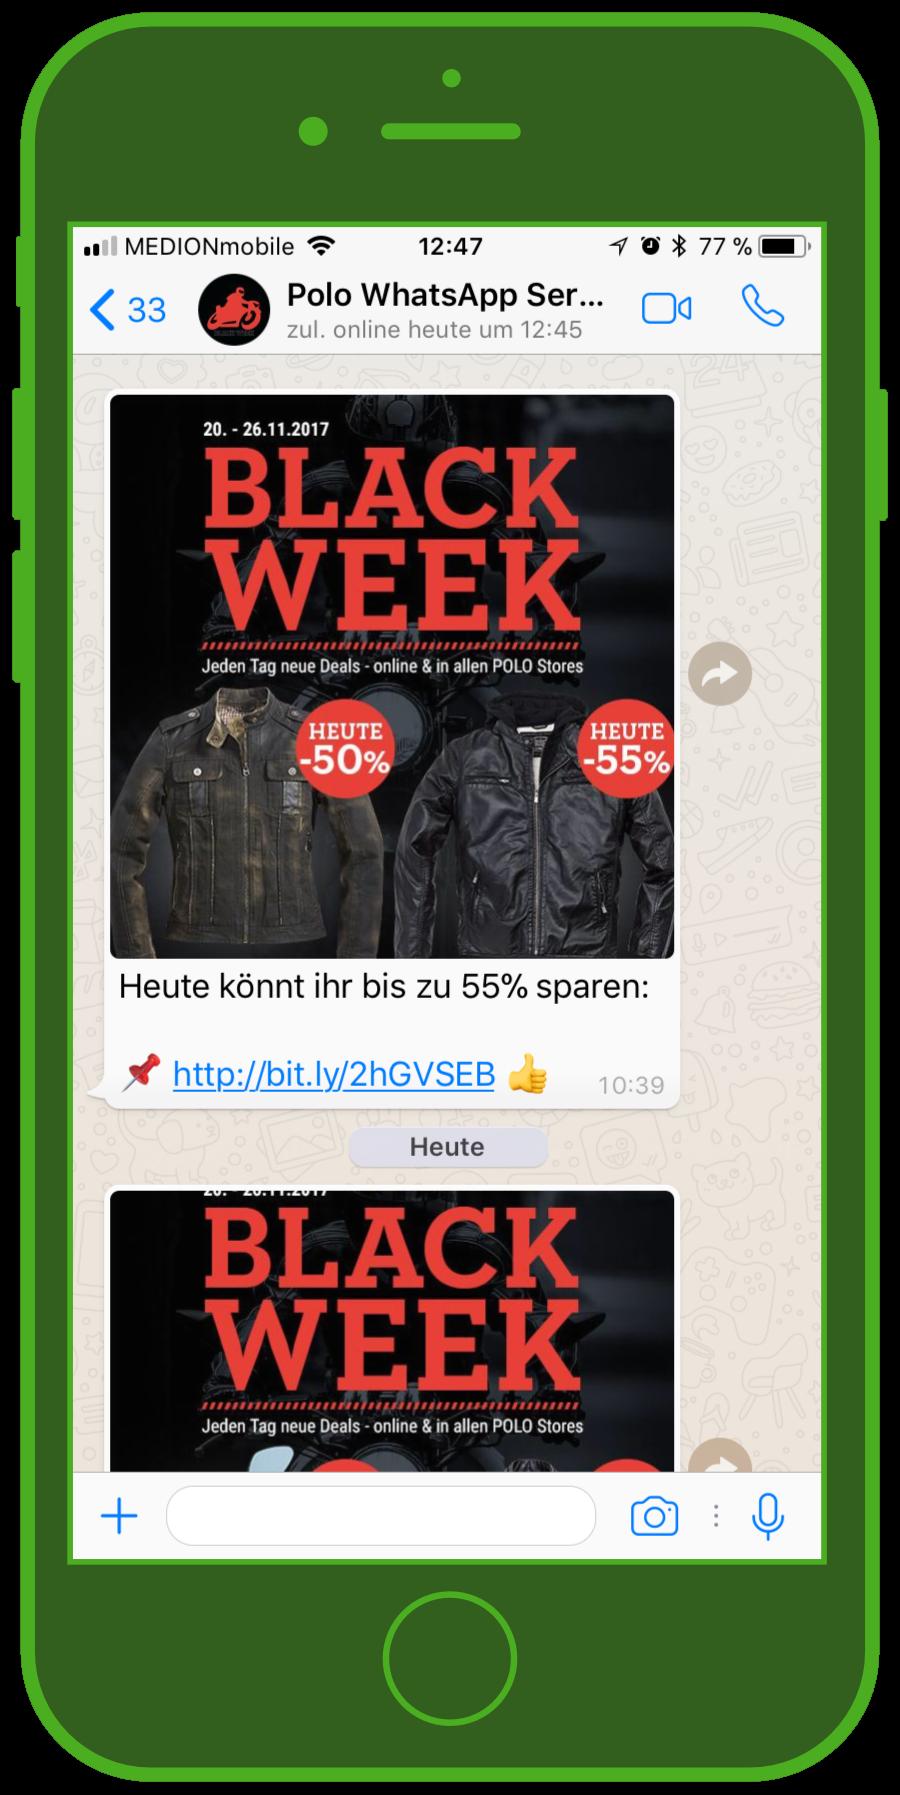 device-polo-whatsapp-blackweek-fashion